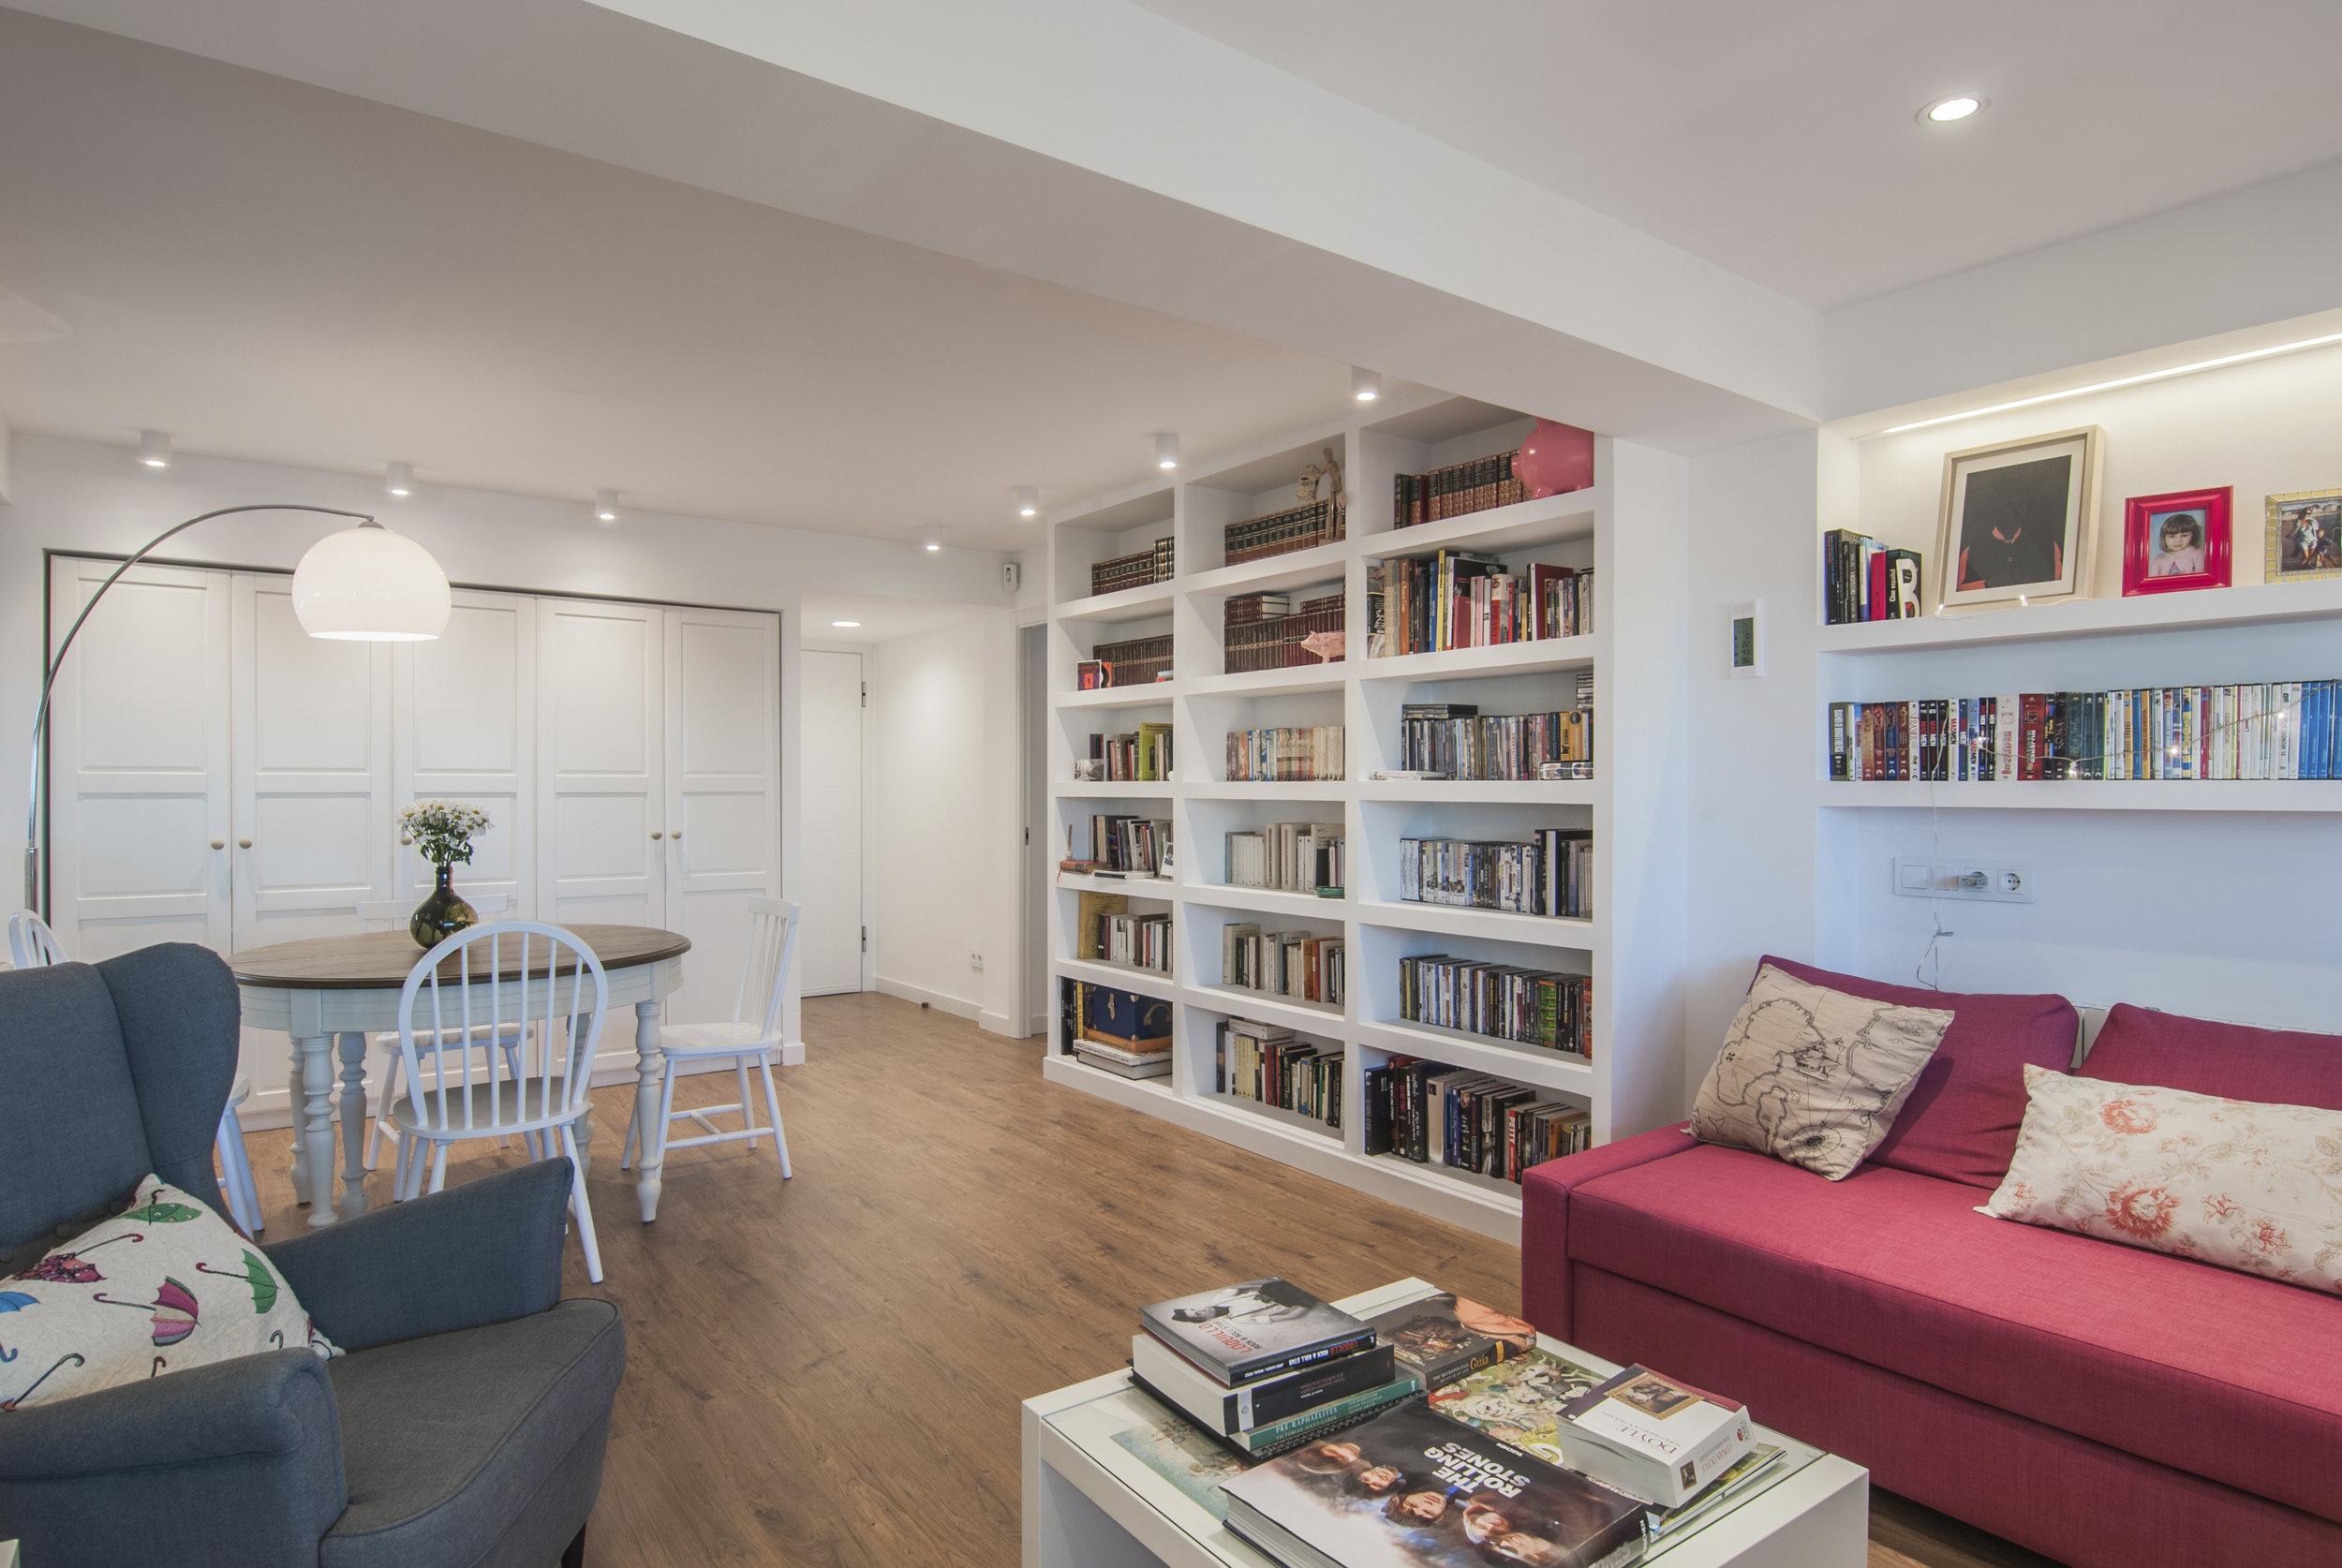 emmme studio slow design interiorismo integral salon comedor hogar Debora.jpg